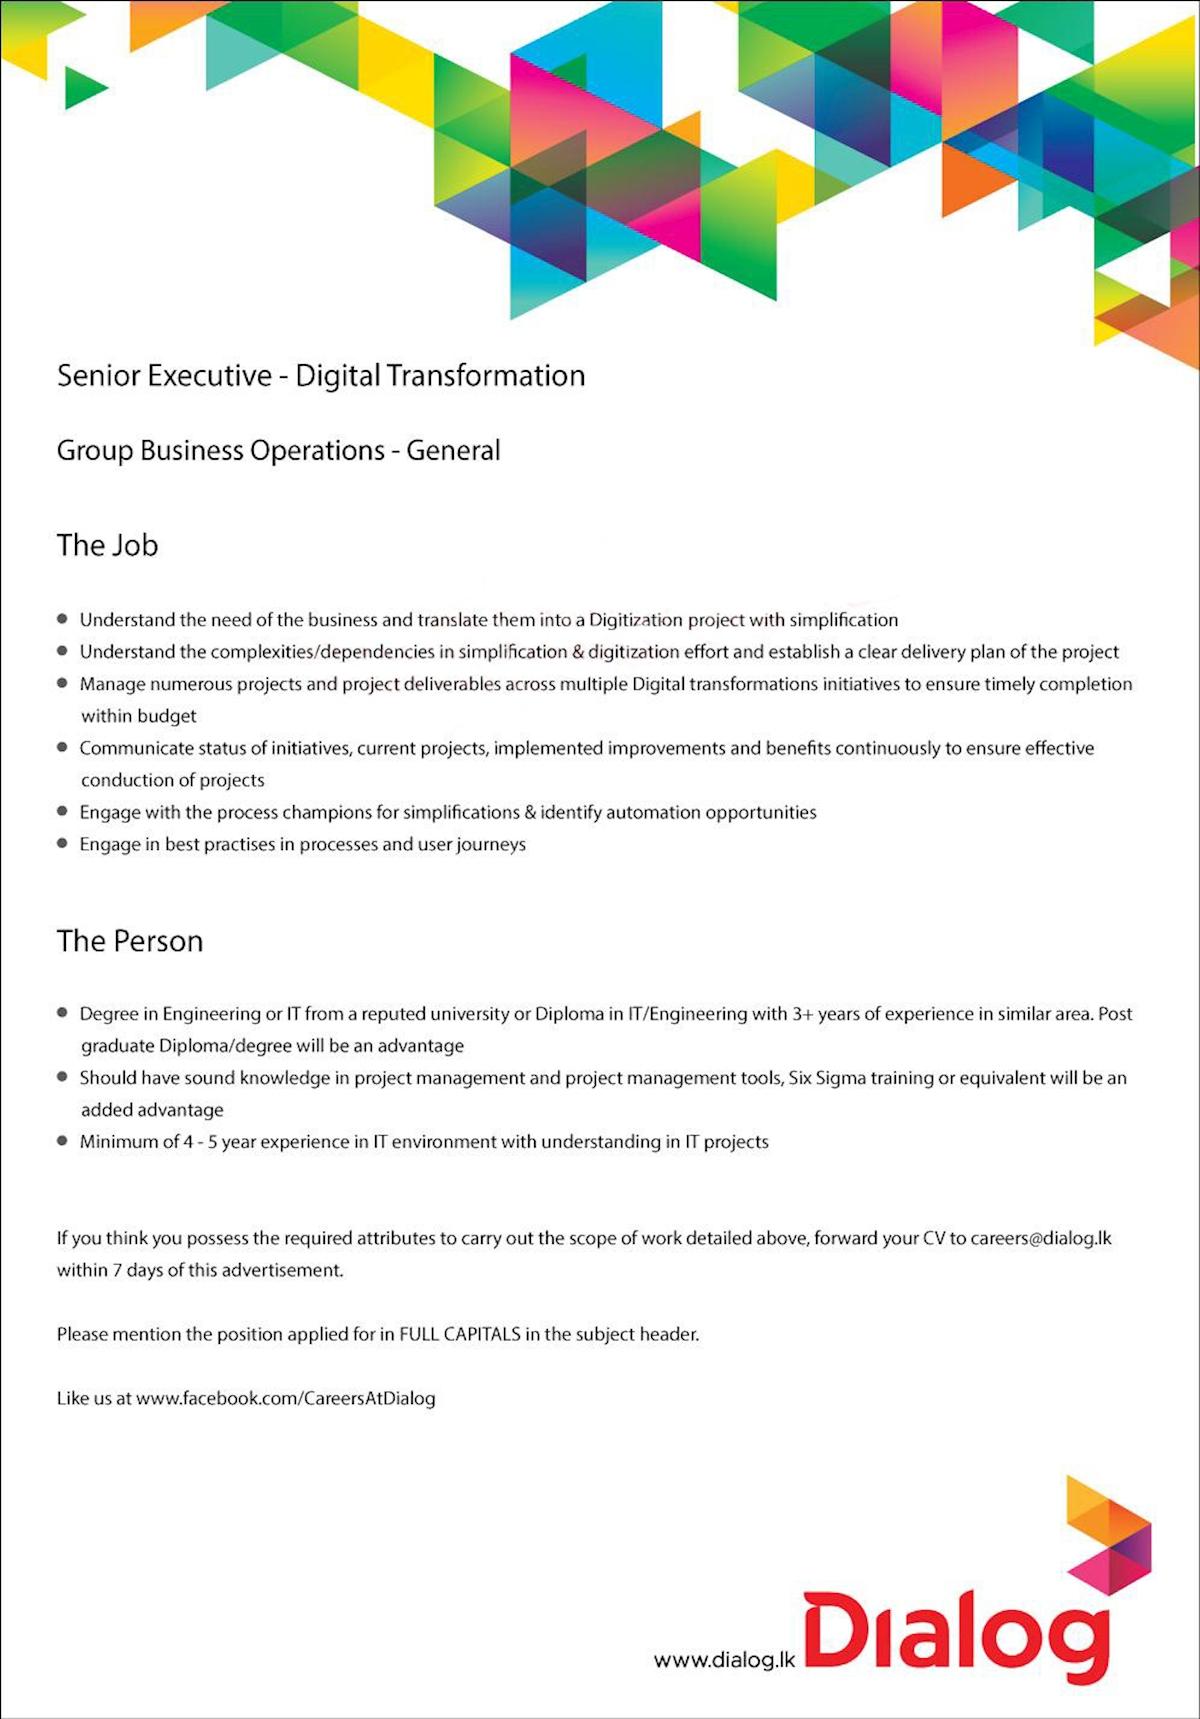 Senior Executive - Digital Transformation